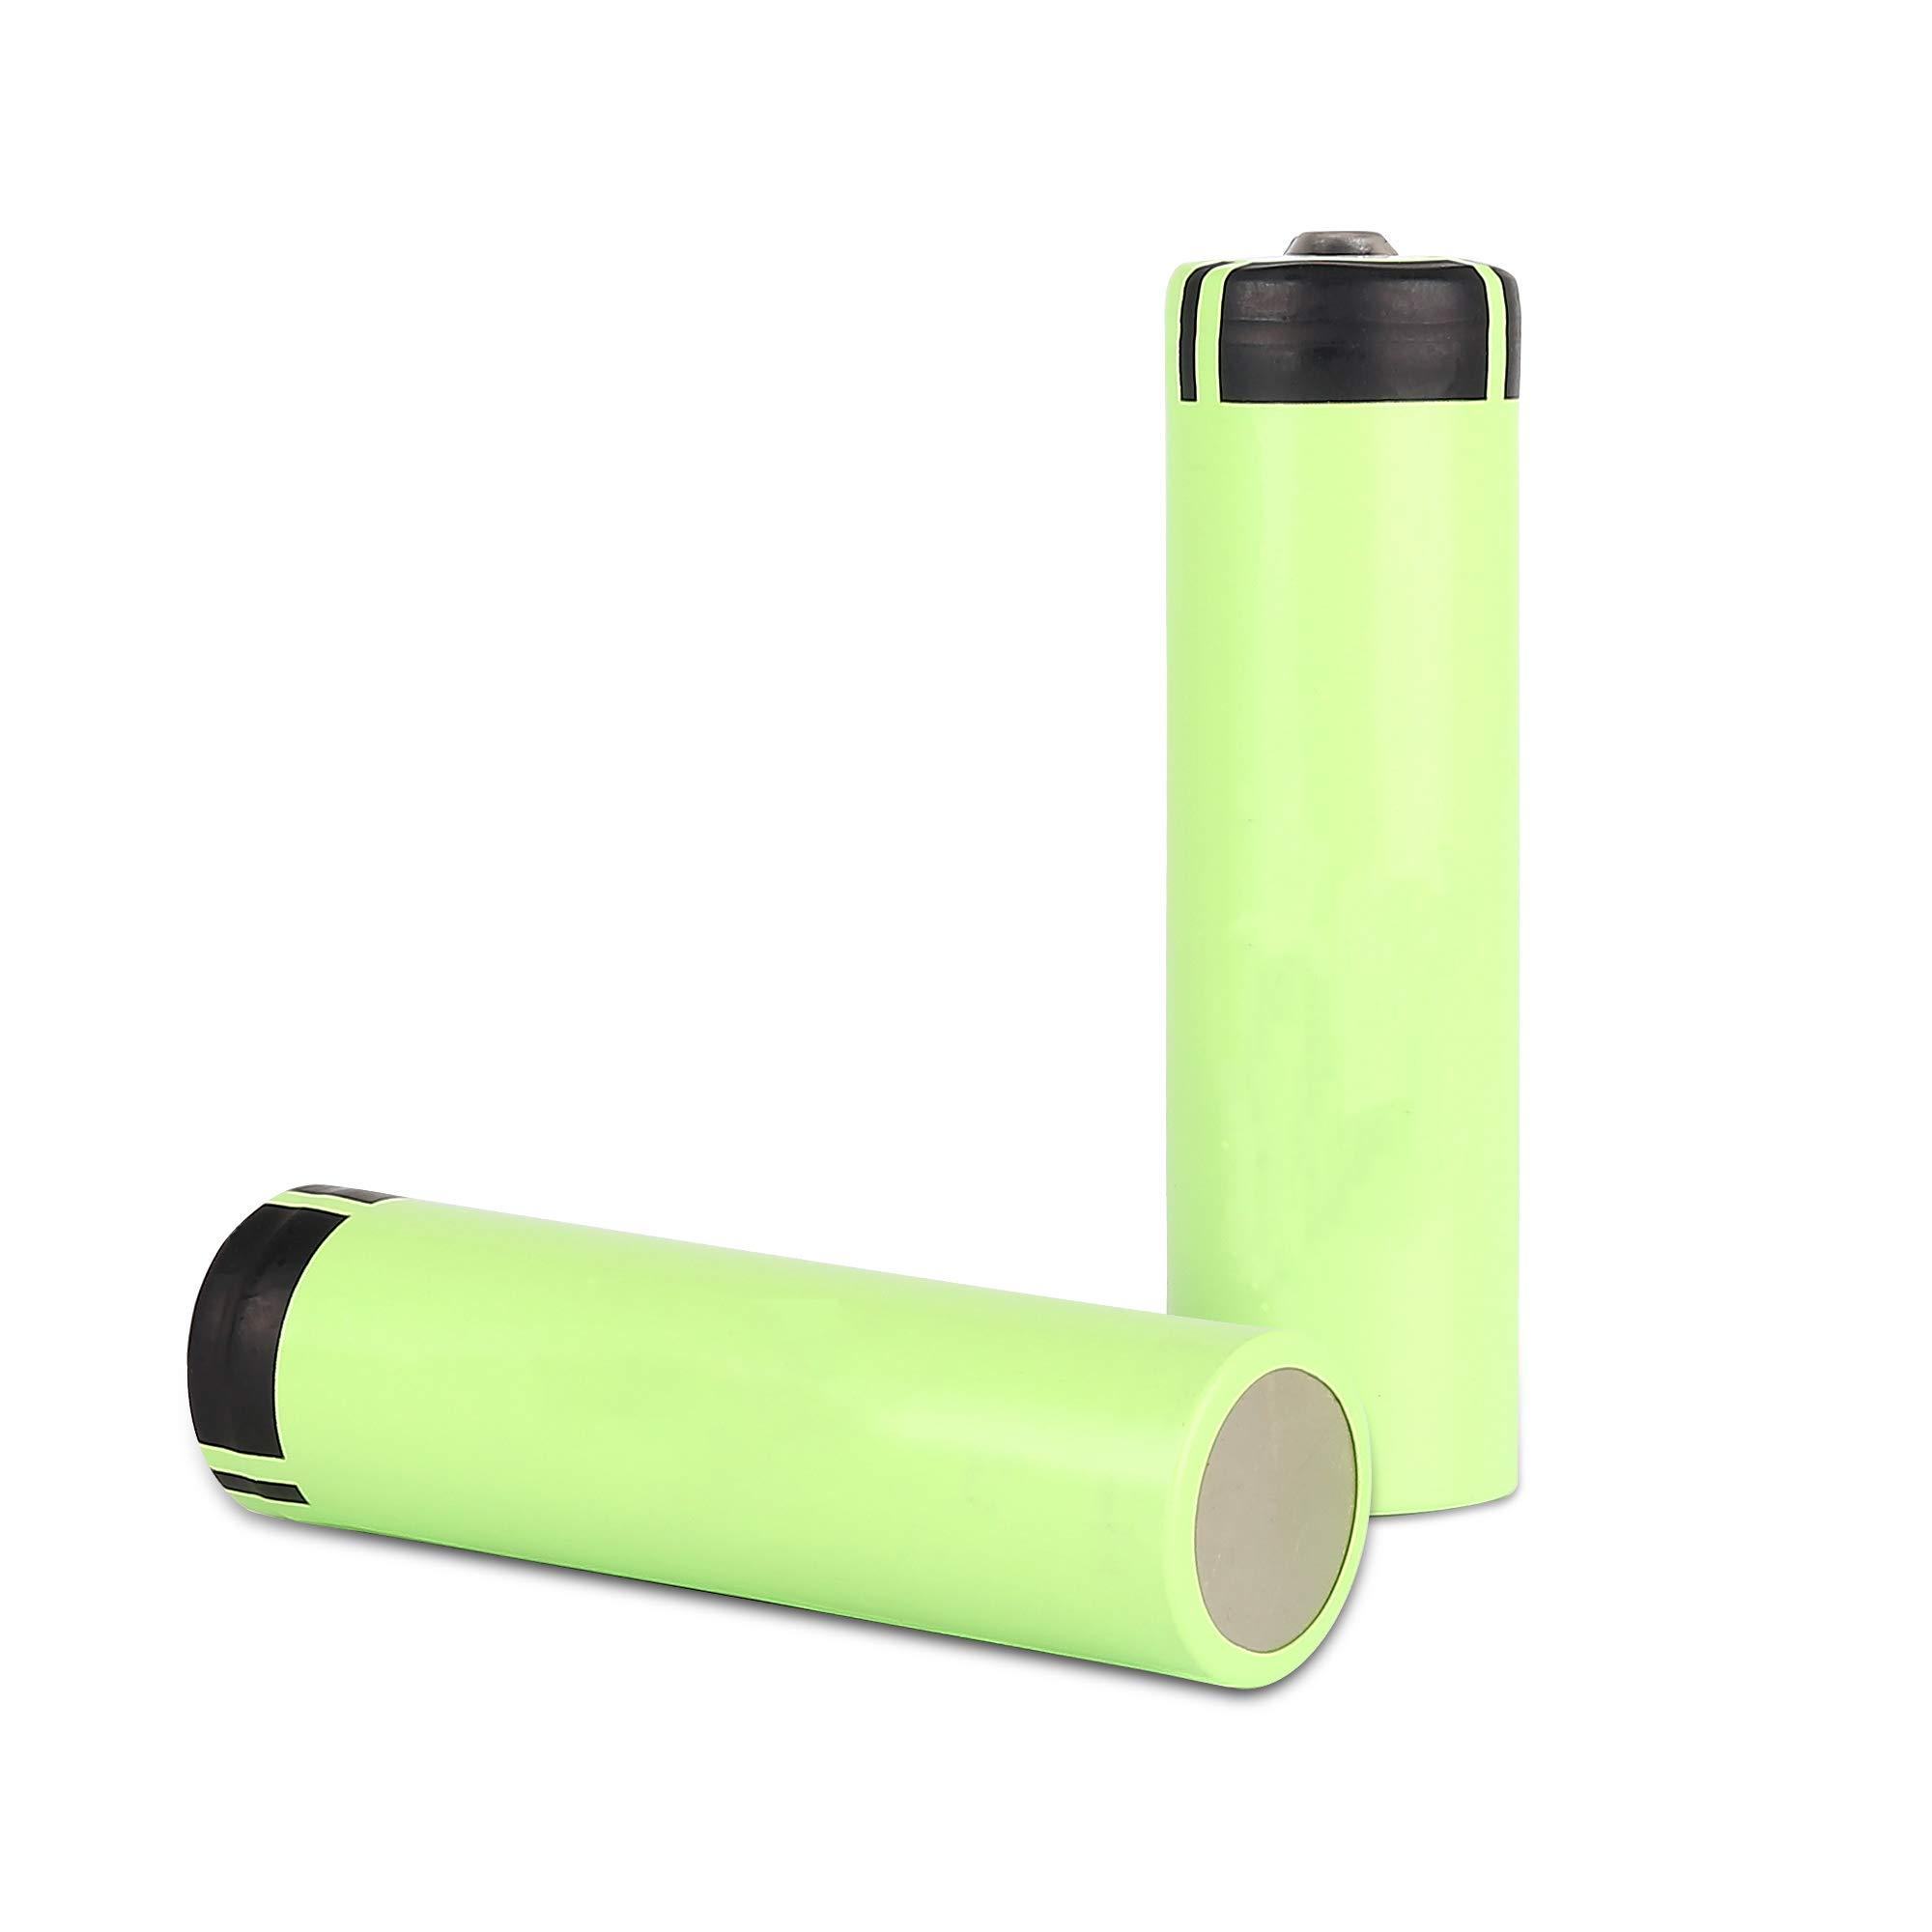 liogea 3.7V Battery 3400mAh 20A Rechargeable Button Top Batteries - 2 Pack by liogea